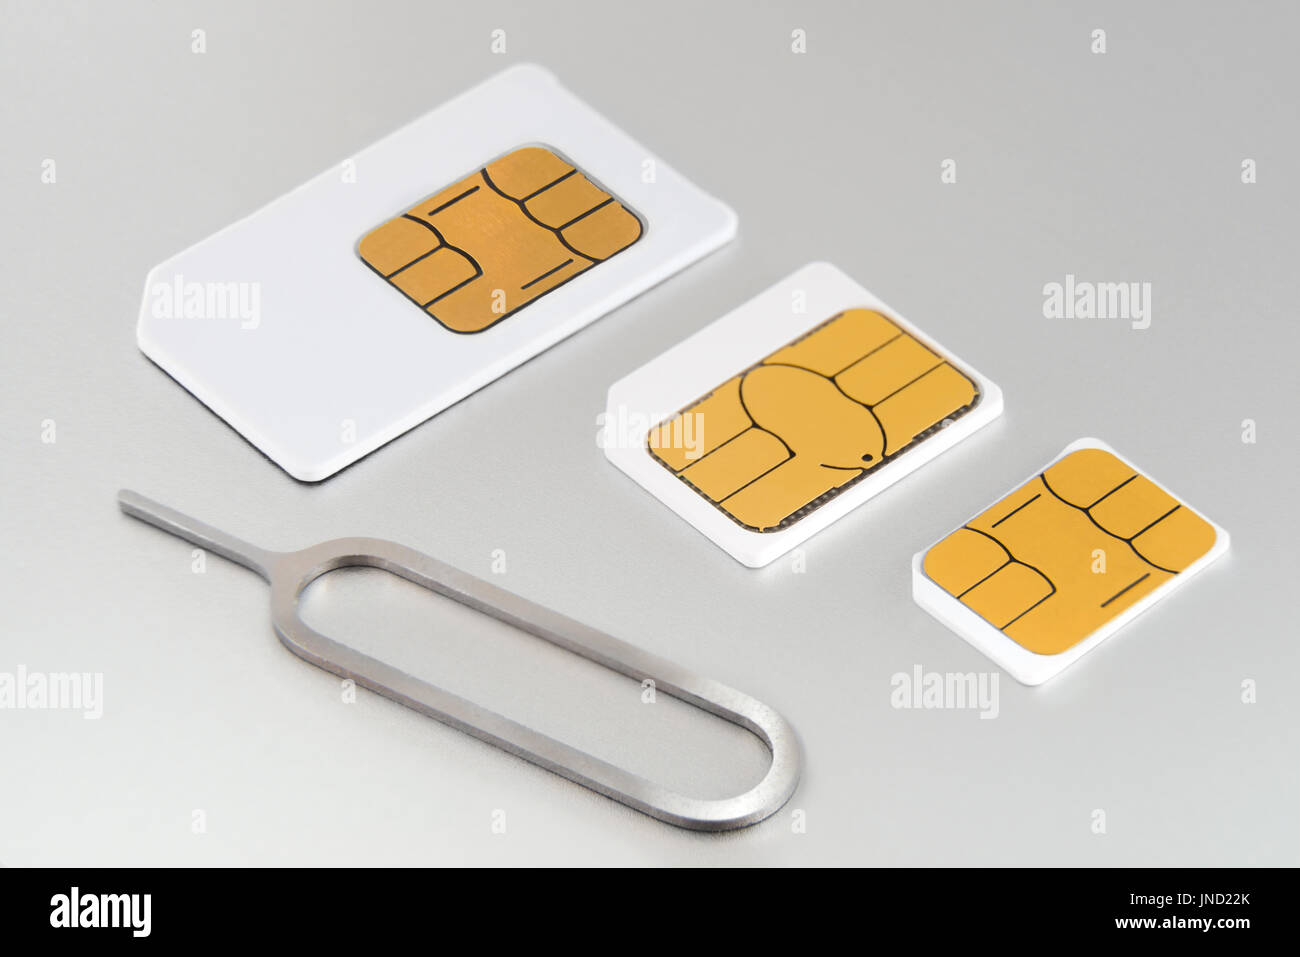 Nano Sim Karte Bilder.Drei Arten Von Gsm Sim Karten Mini Sim Micro Sim Und Nano Sim